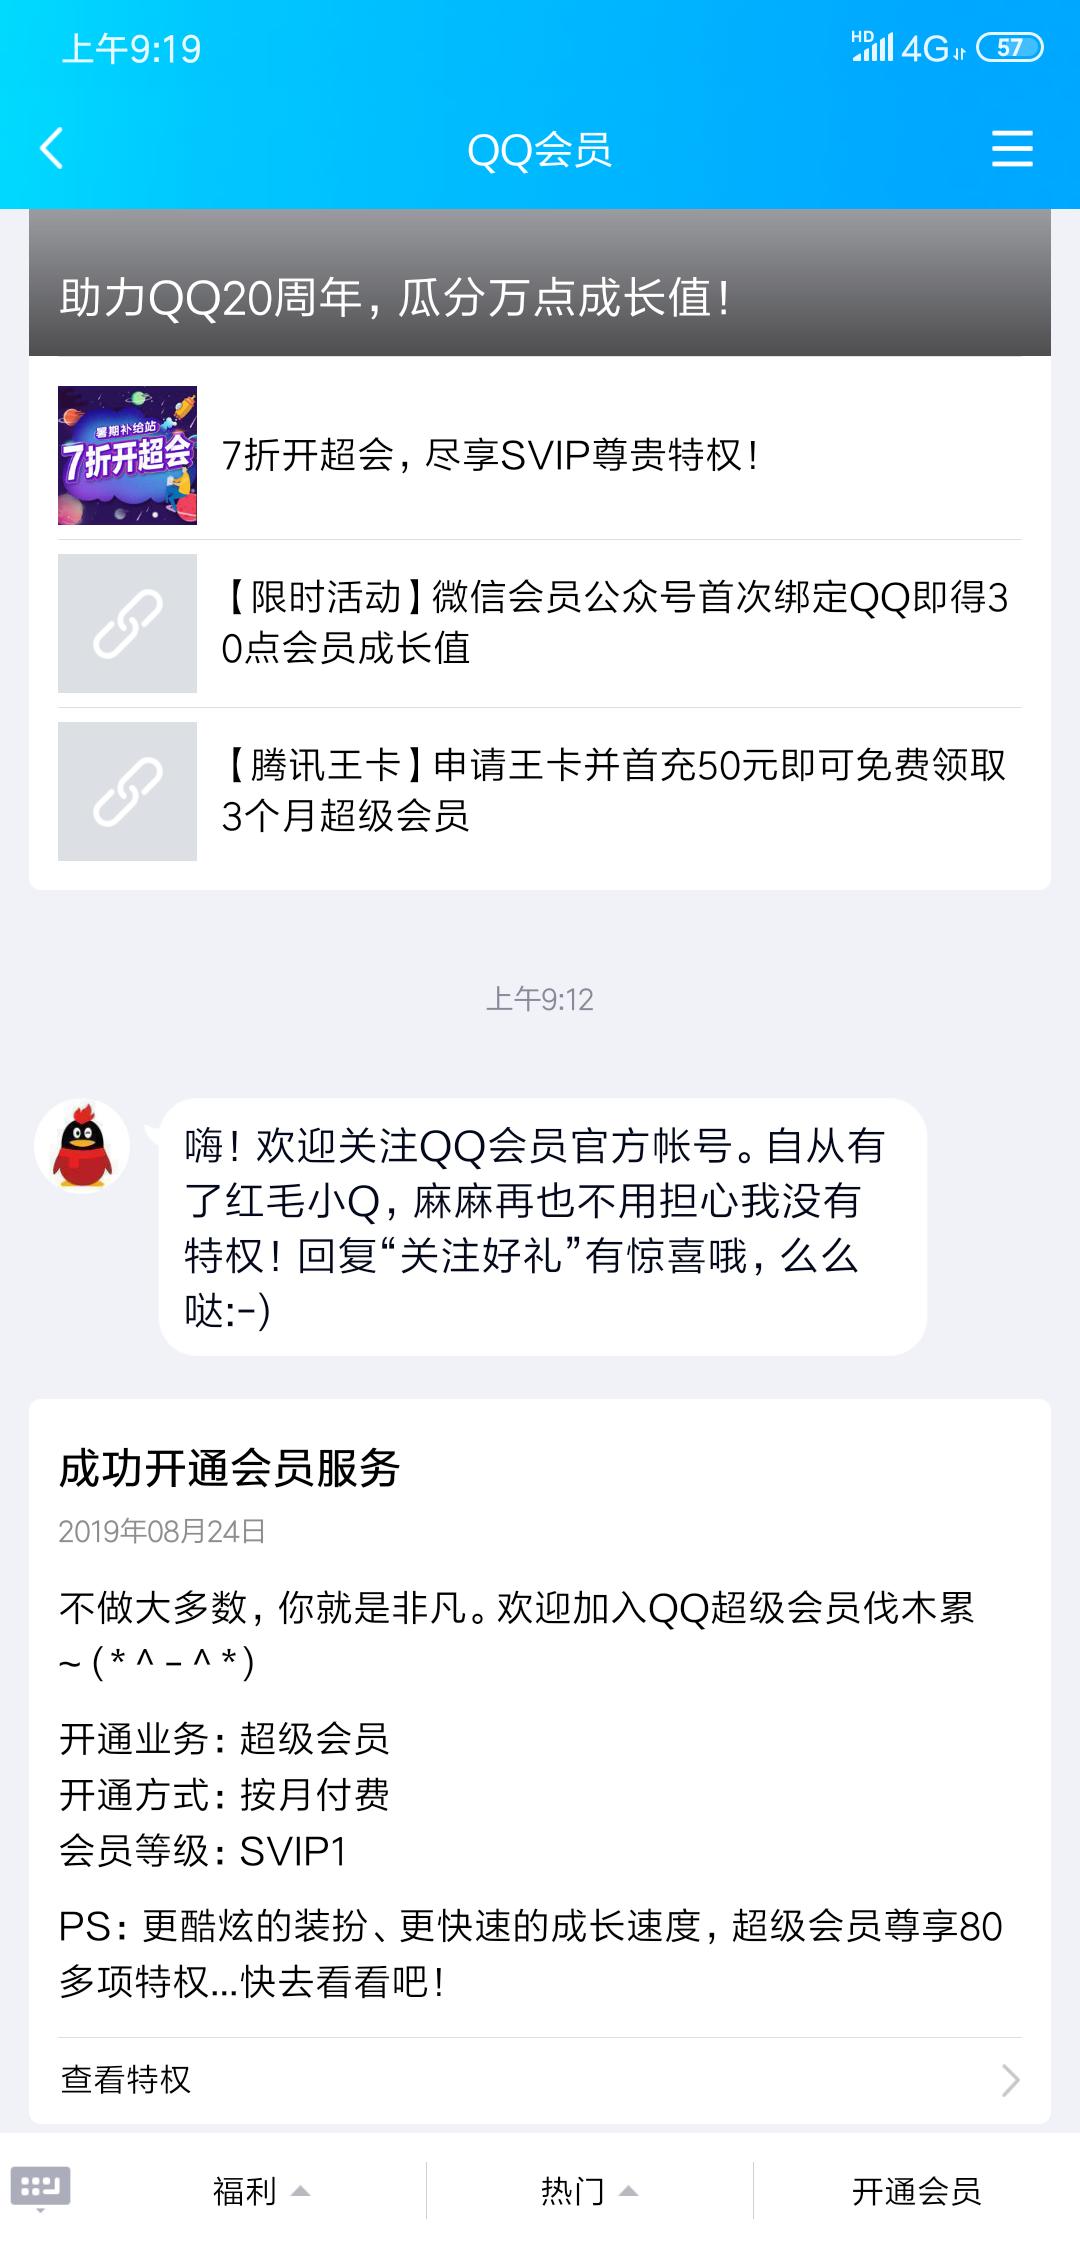 Screenshot_2019-08-24-09-19-56-091_com.tencent.mobileqq.png